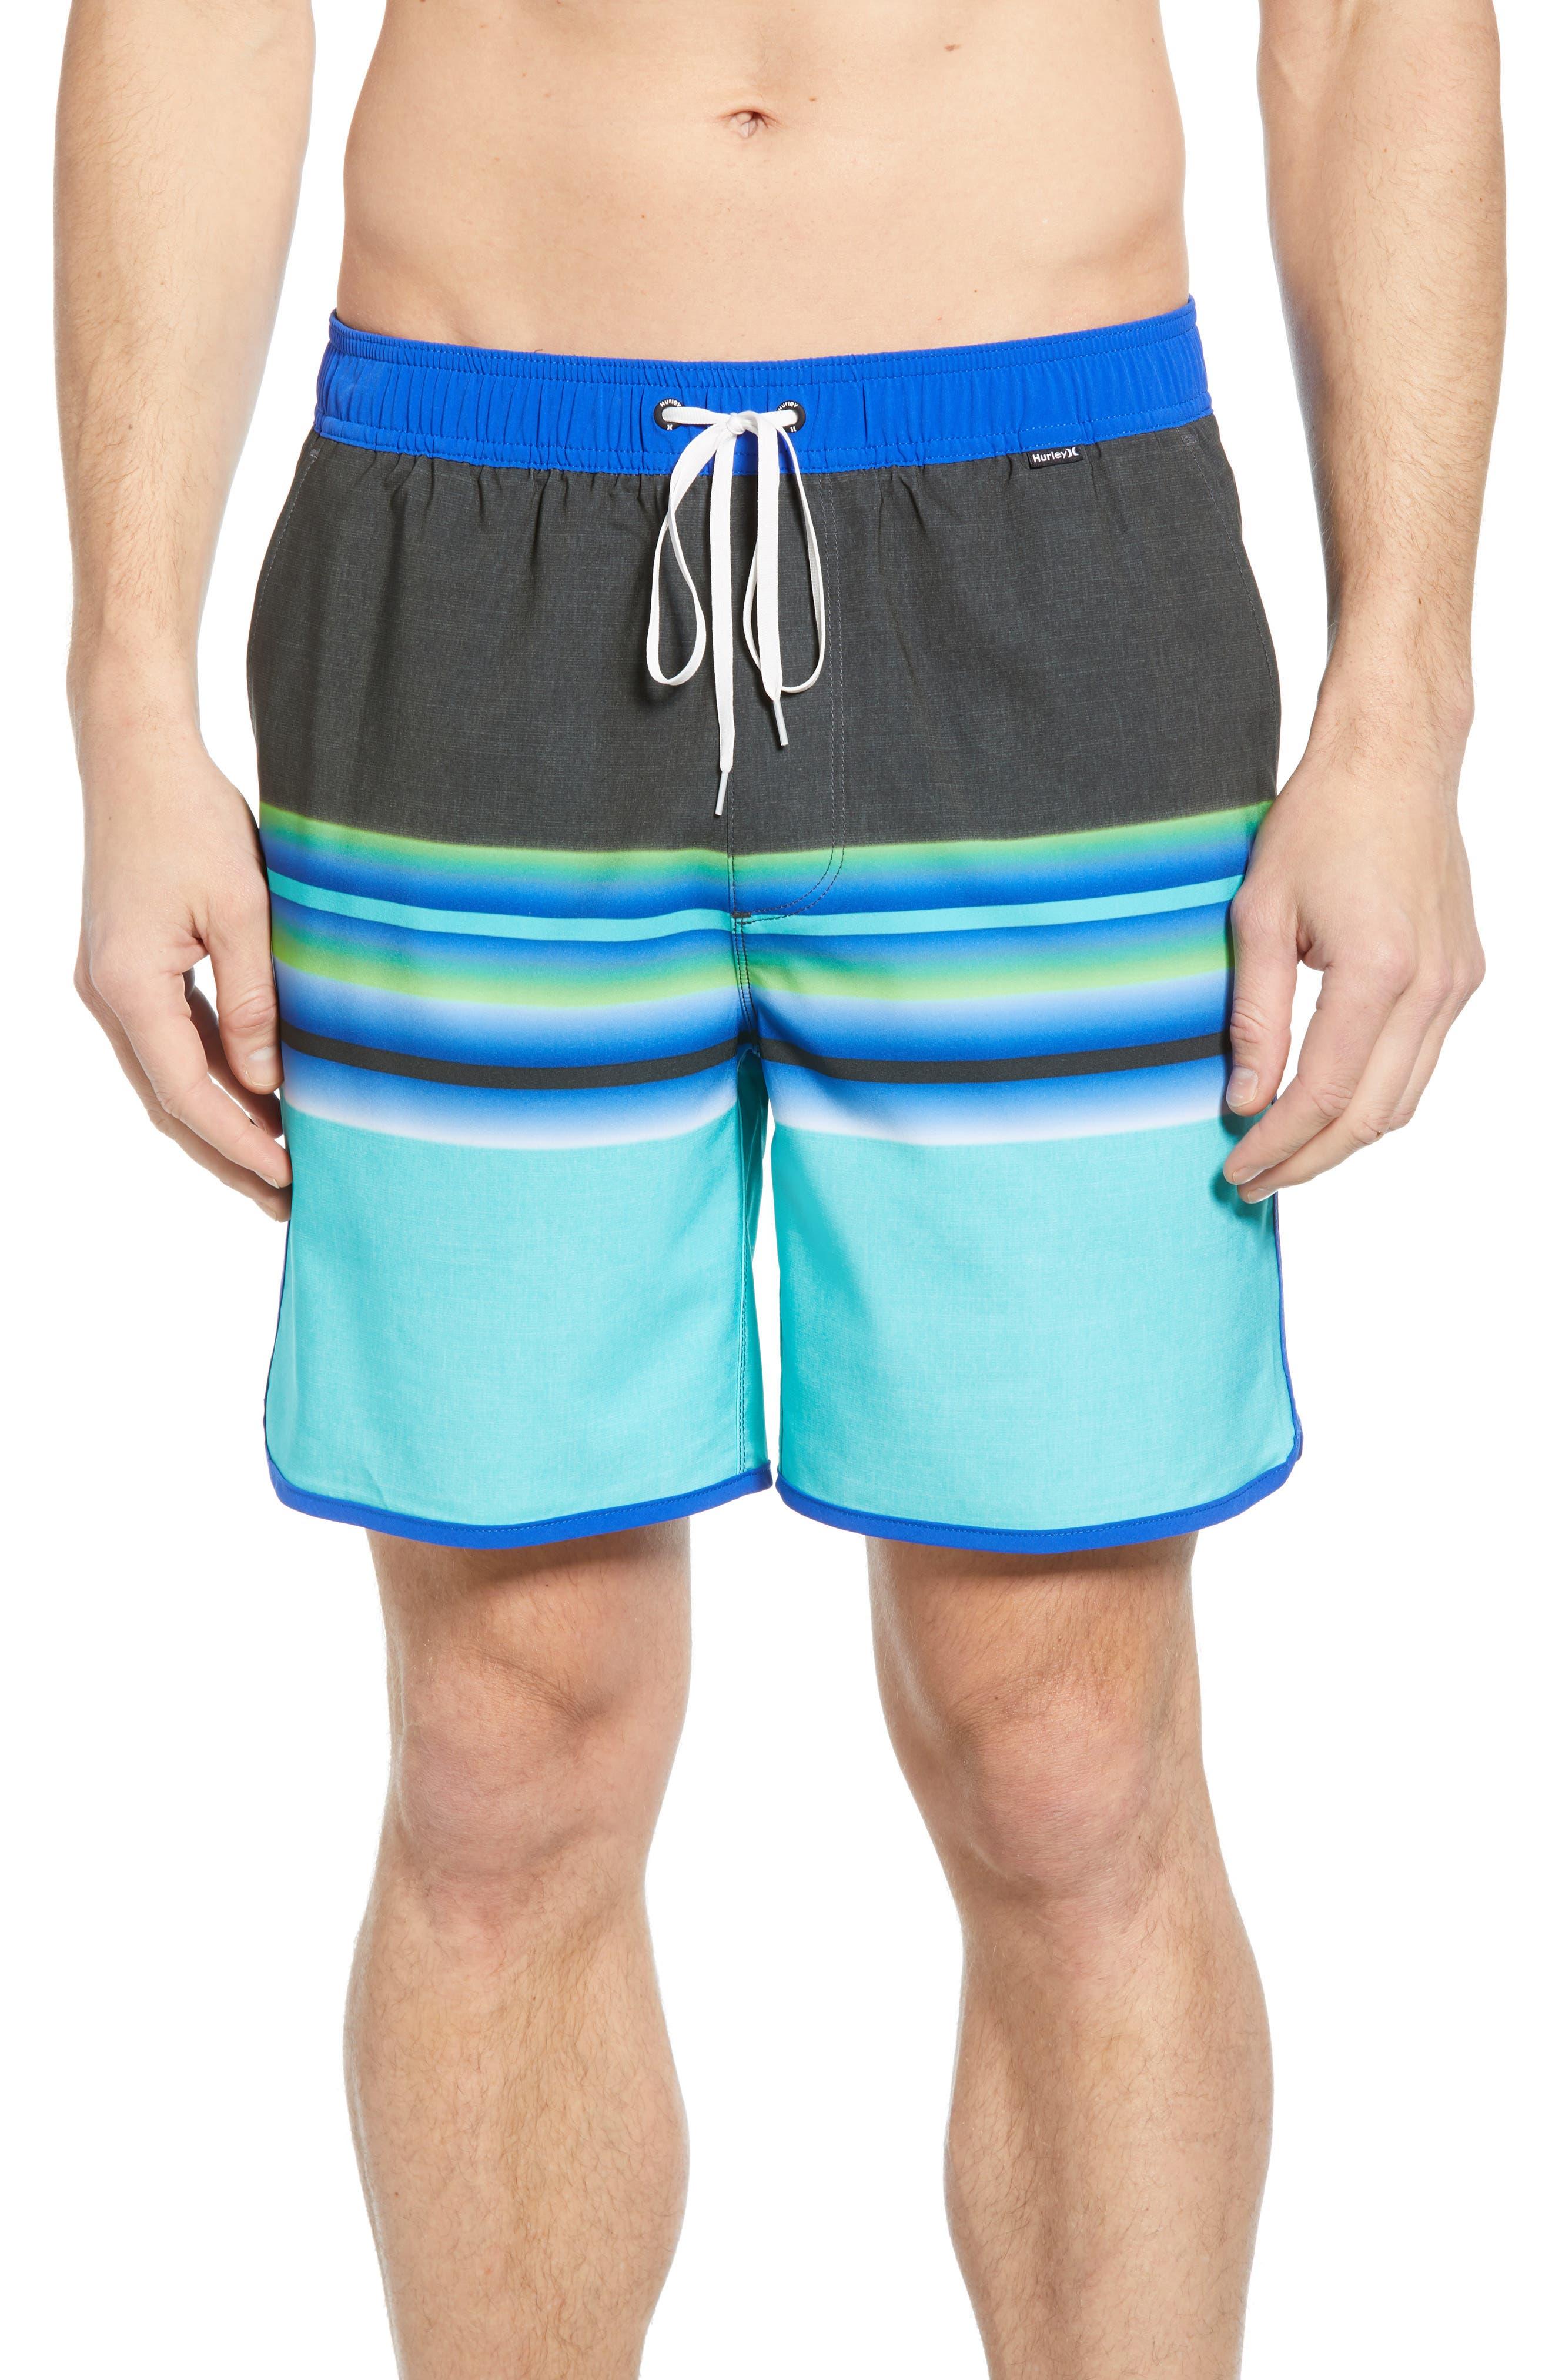 Hurley Phantom Zen Volley Swim Trunks, Blue/green